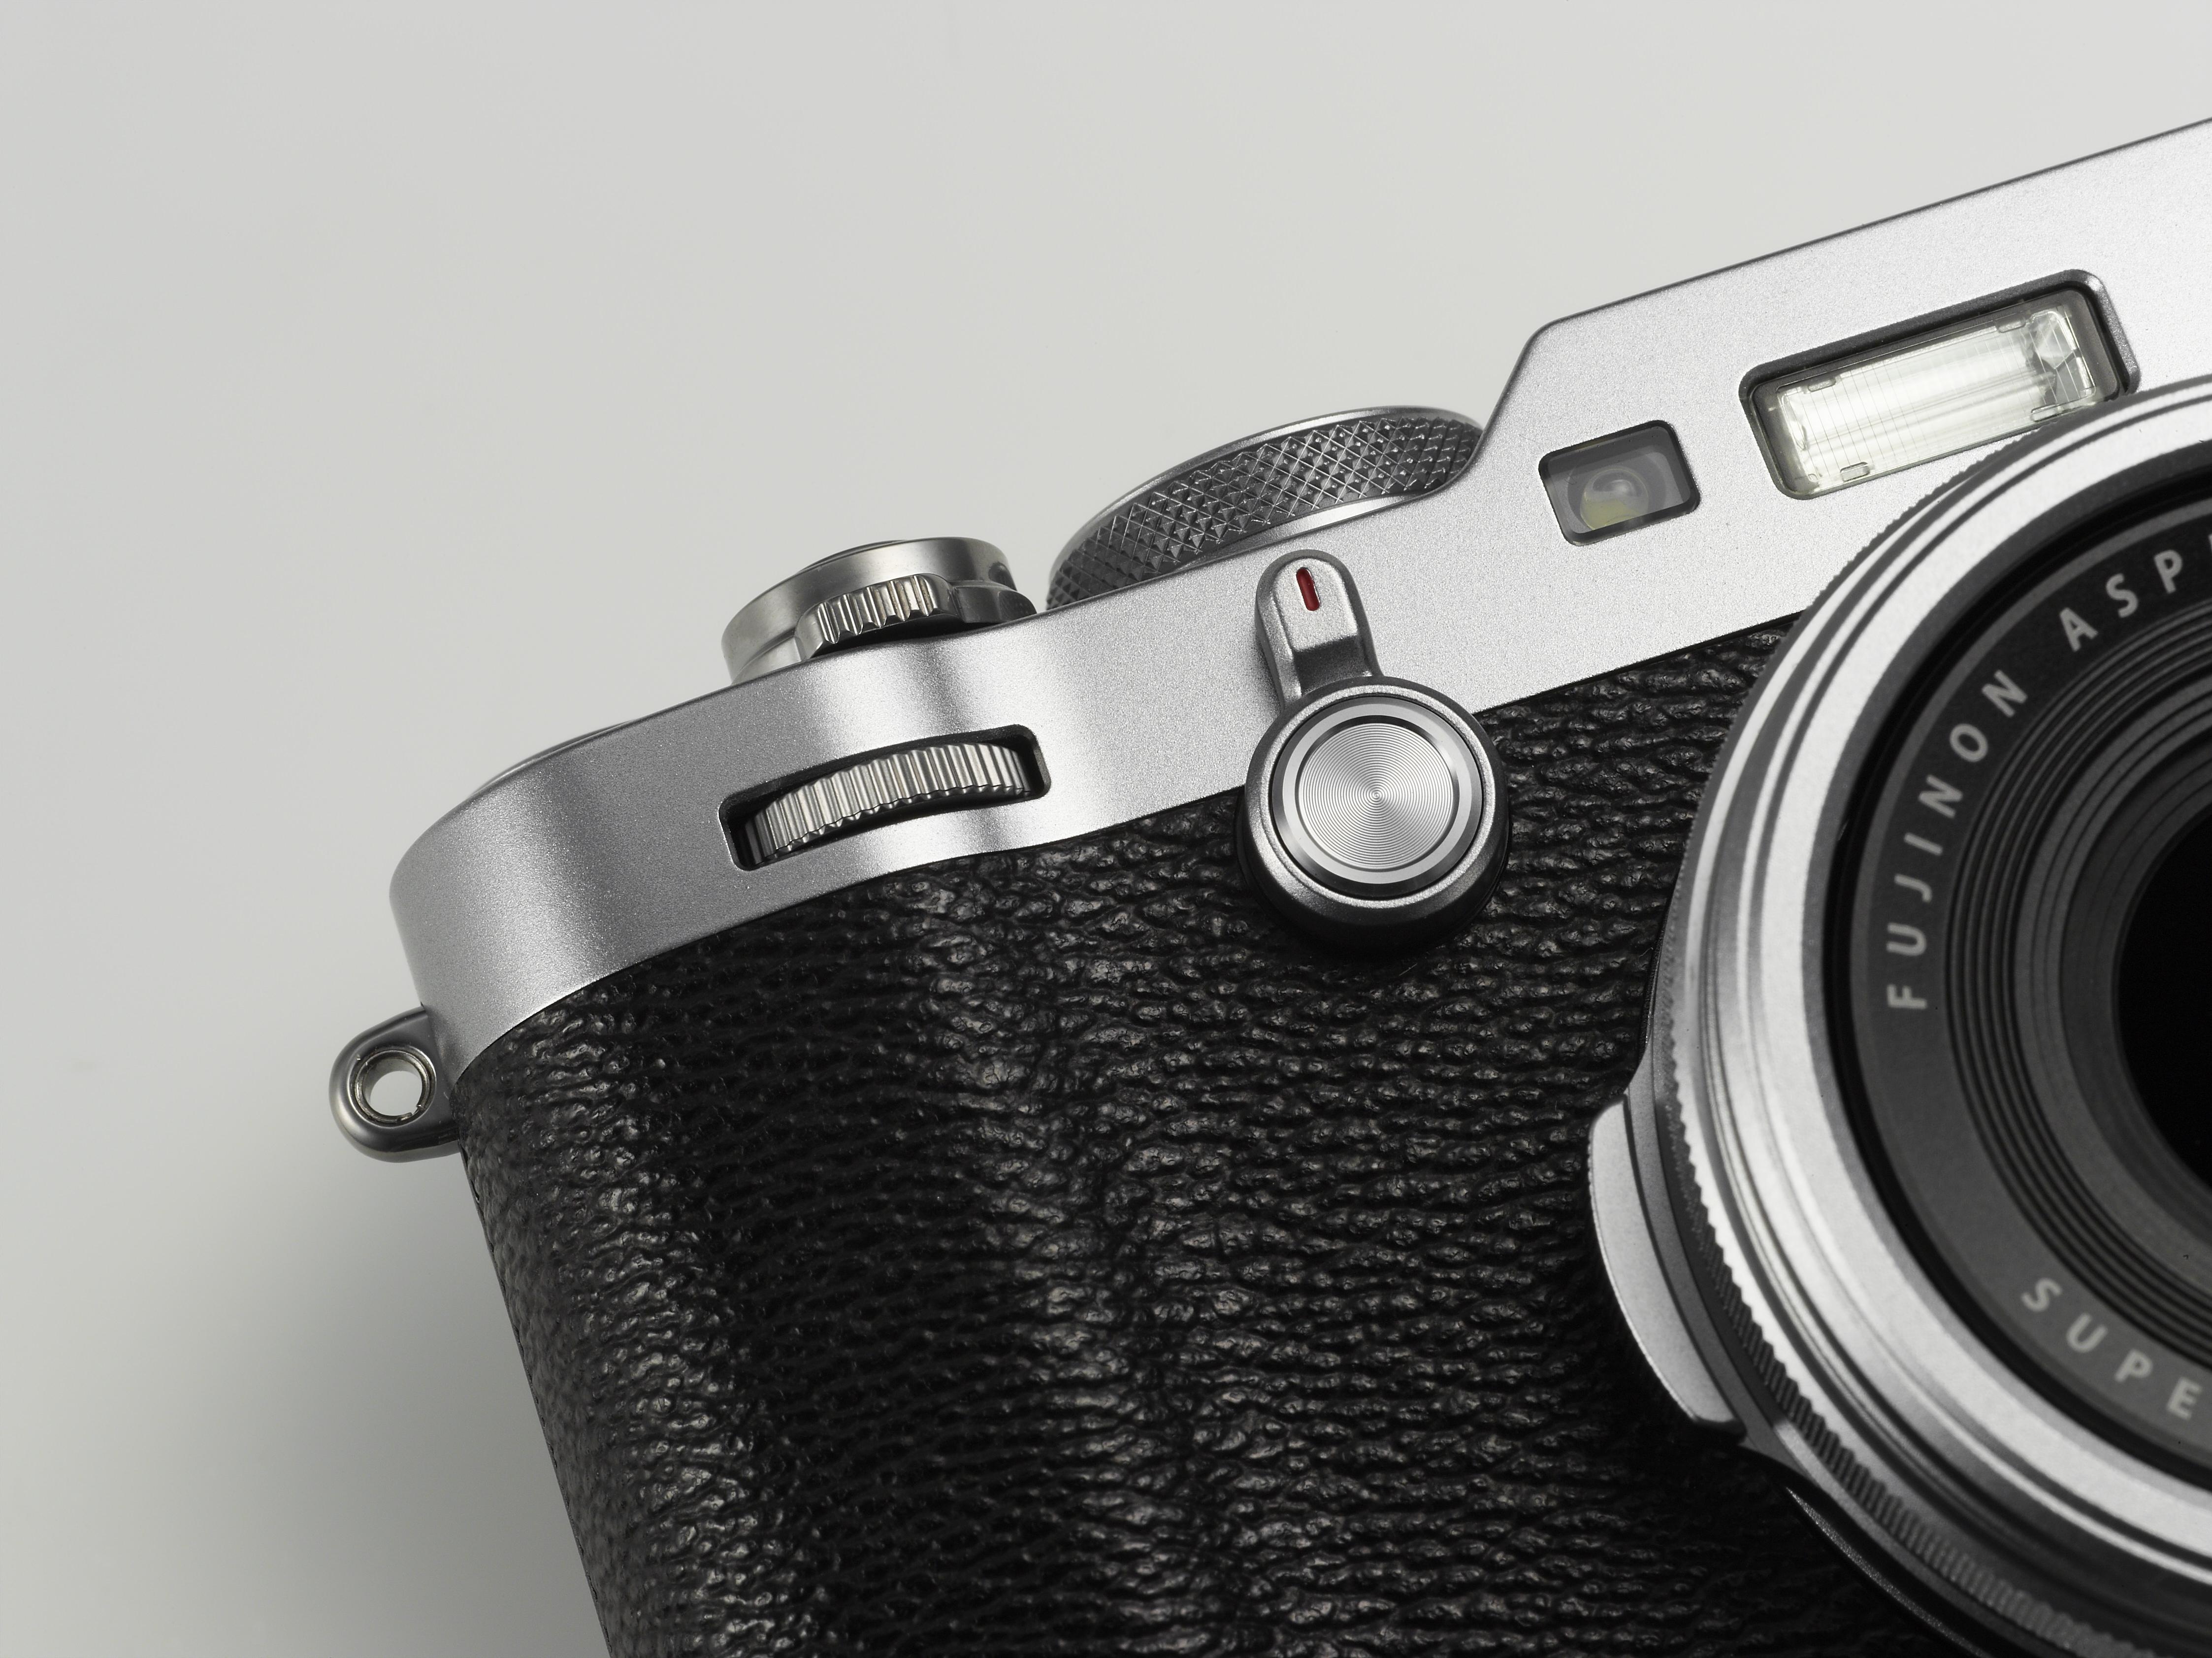 Fujifilm X100F Premium Compact With 24 3 Megapixel Sensor   ePHOTOzine